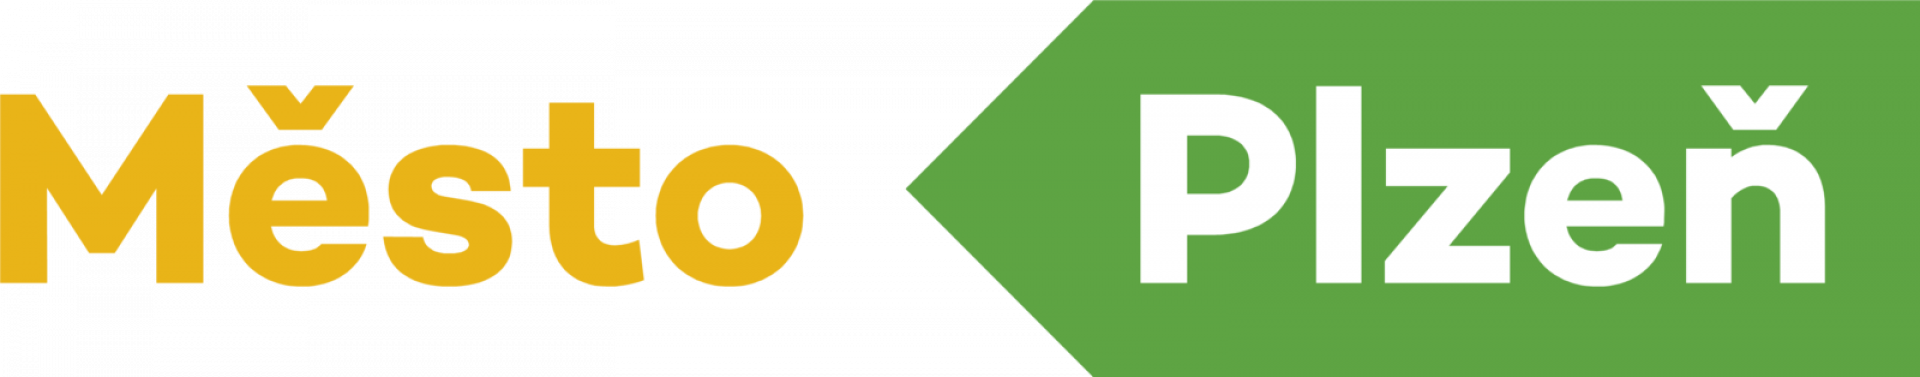 Plzen-logo.png